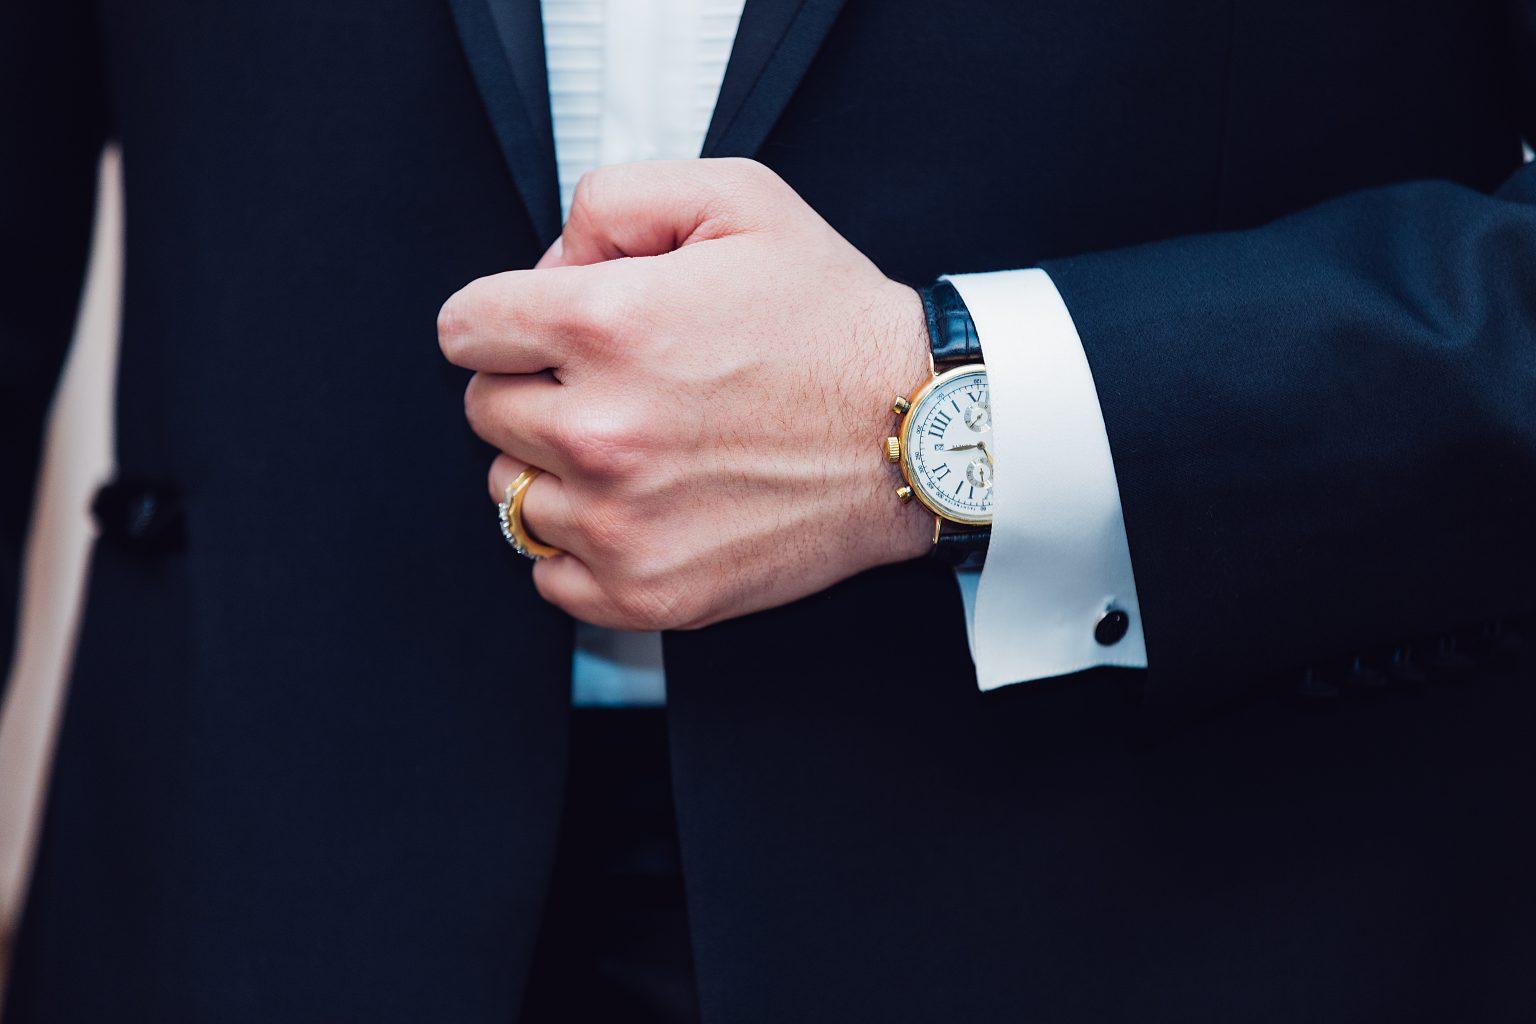 Huye del principio de Peter: Pasa de técnico a directivo con éxito